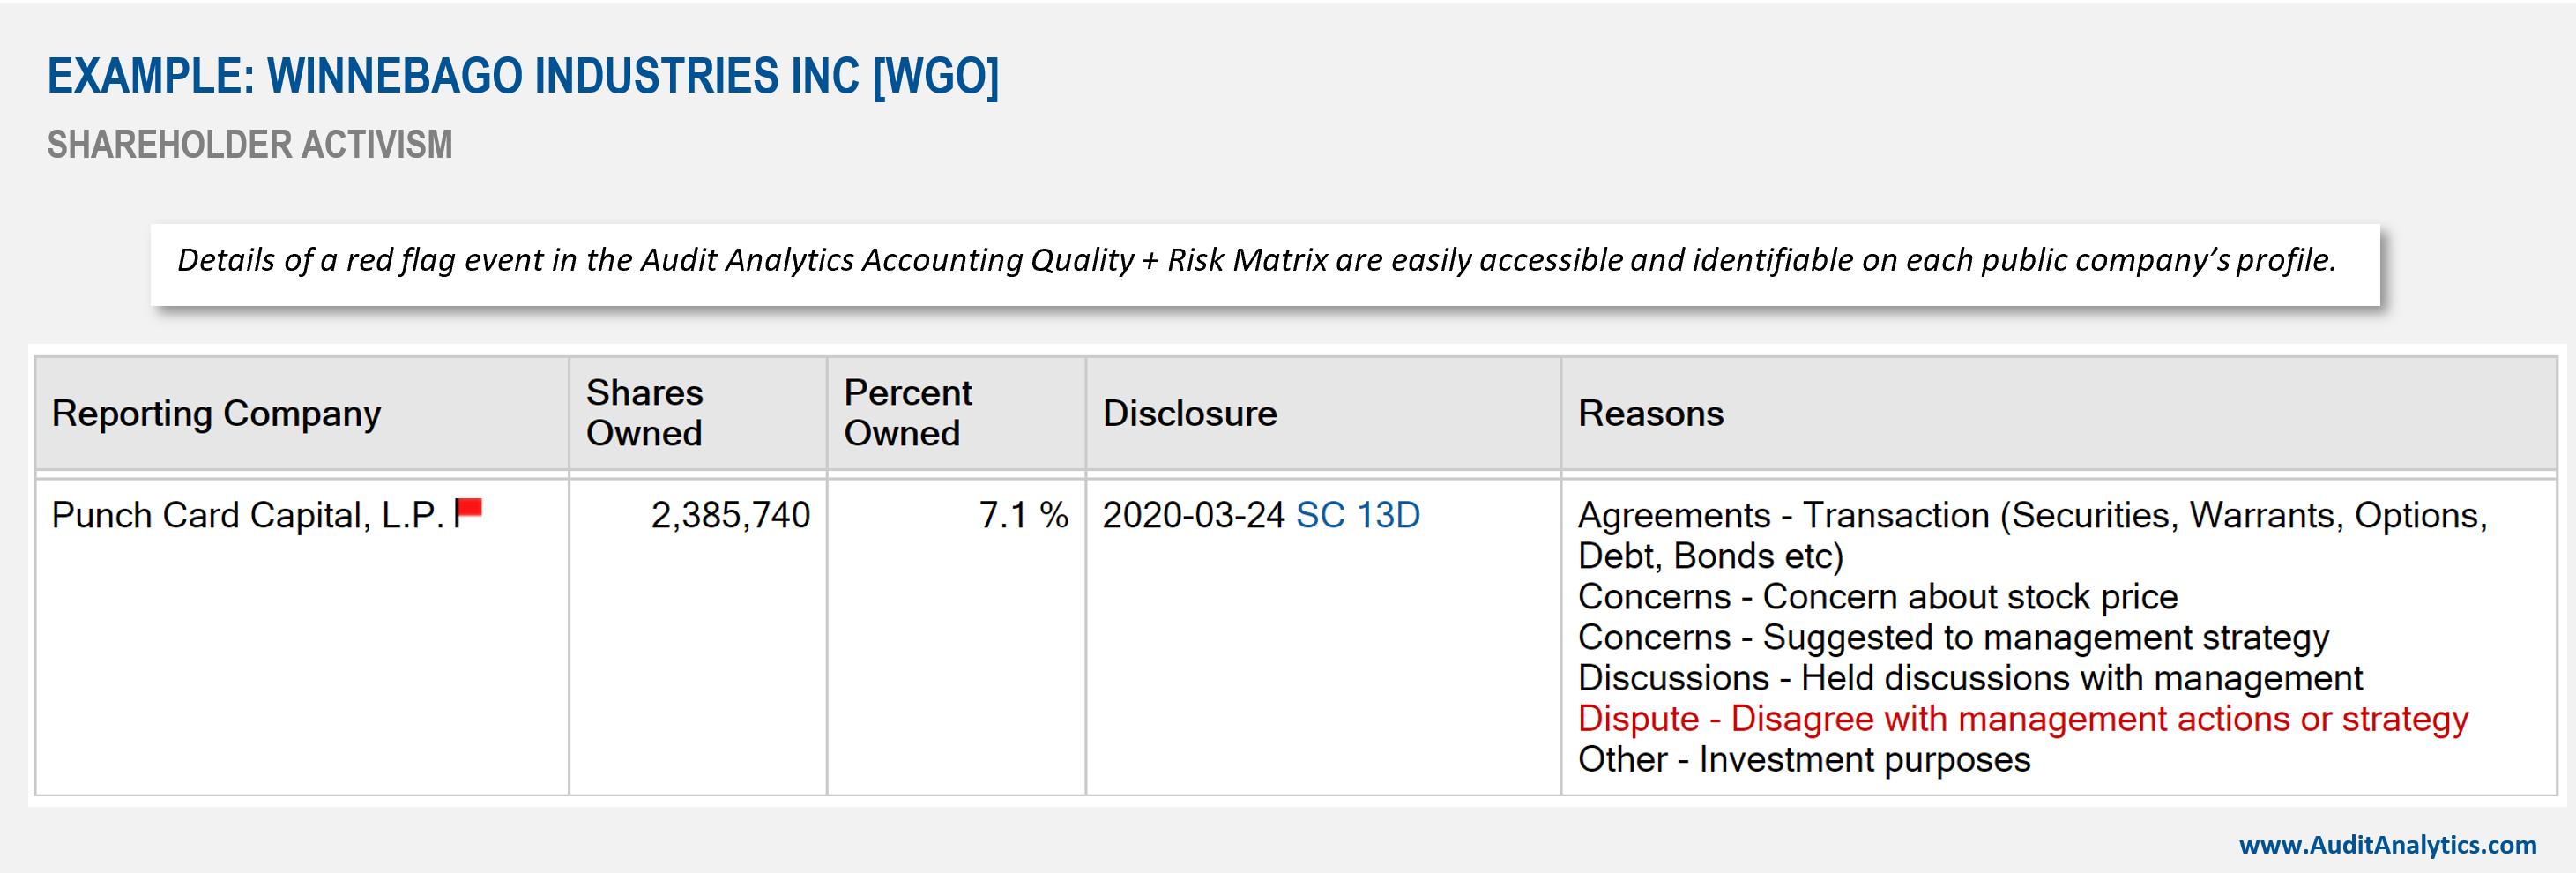 Shareholder activism details on Audit Analytics company profile page